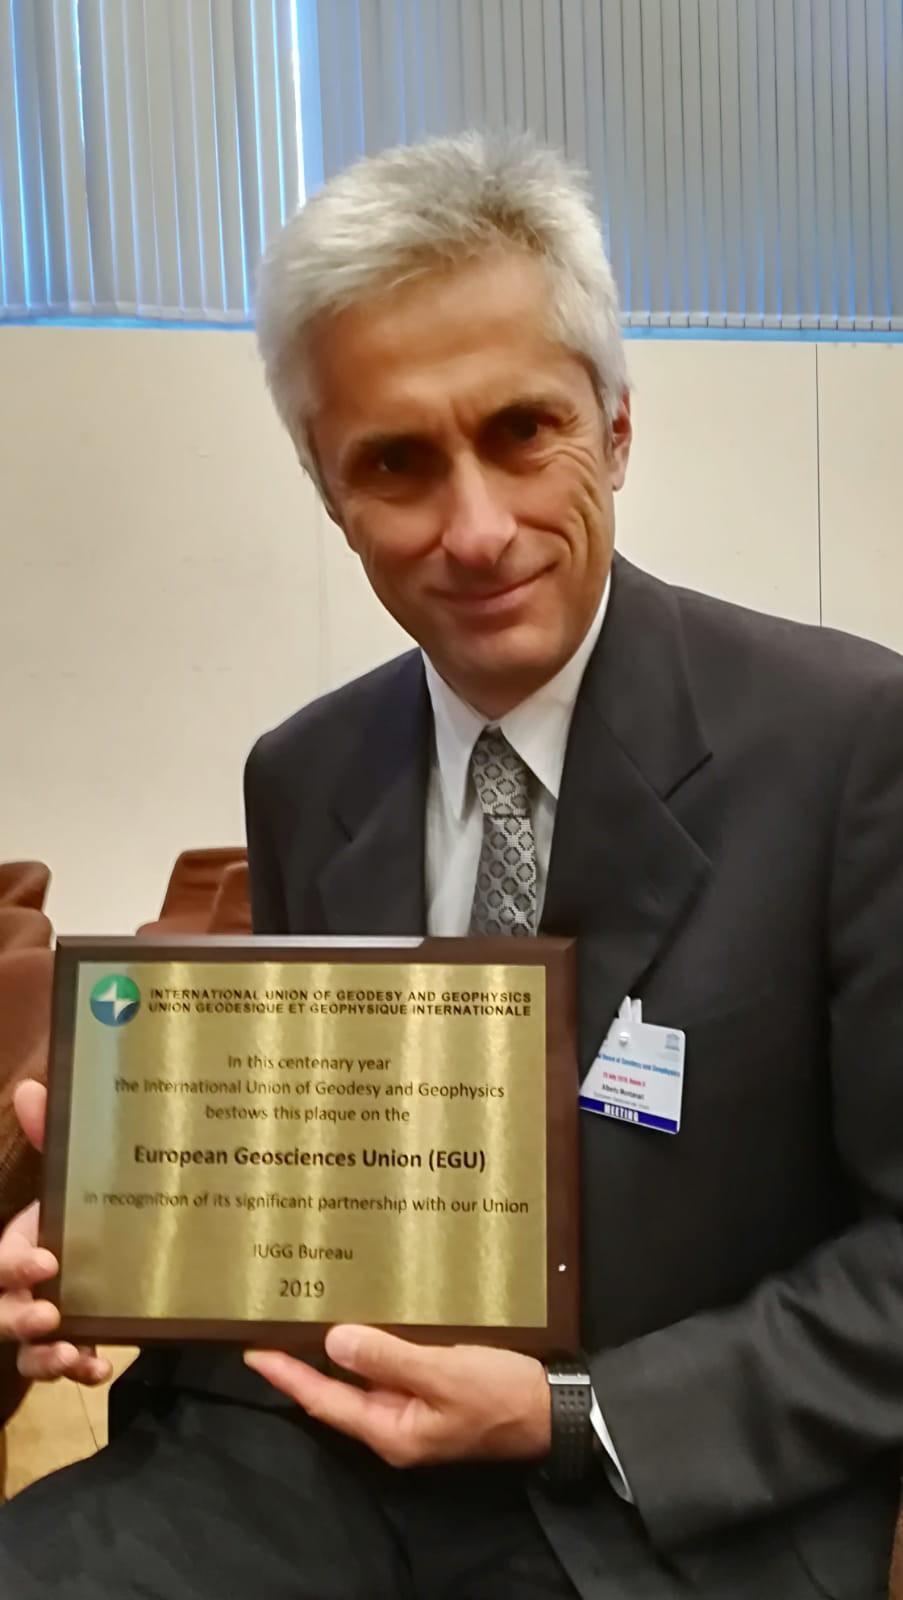 EGU President Alberto Montanari with IUGG plaque bestowed to EGU